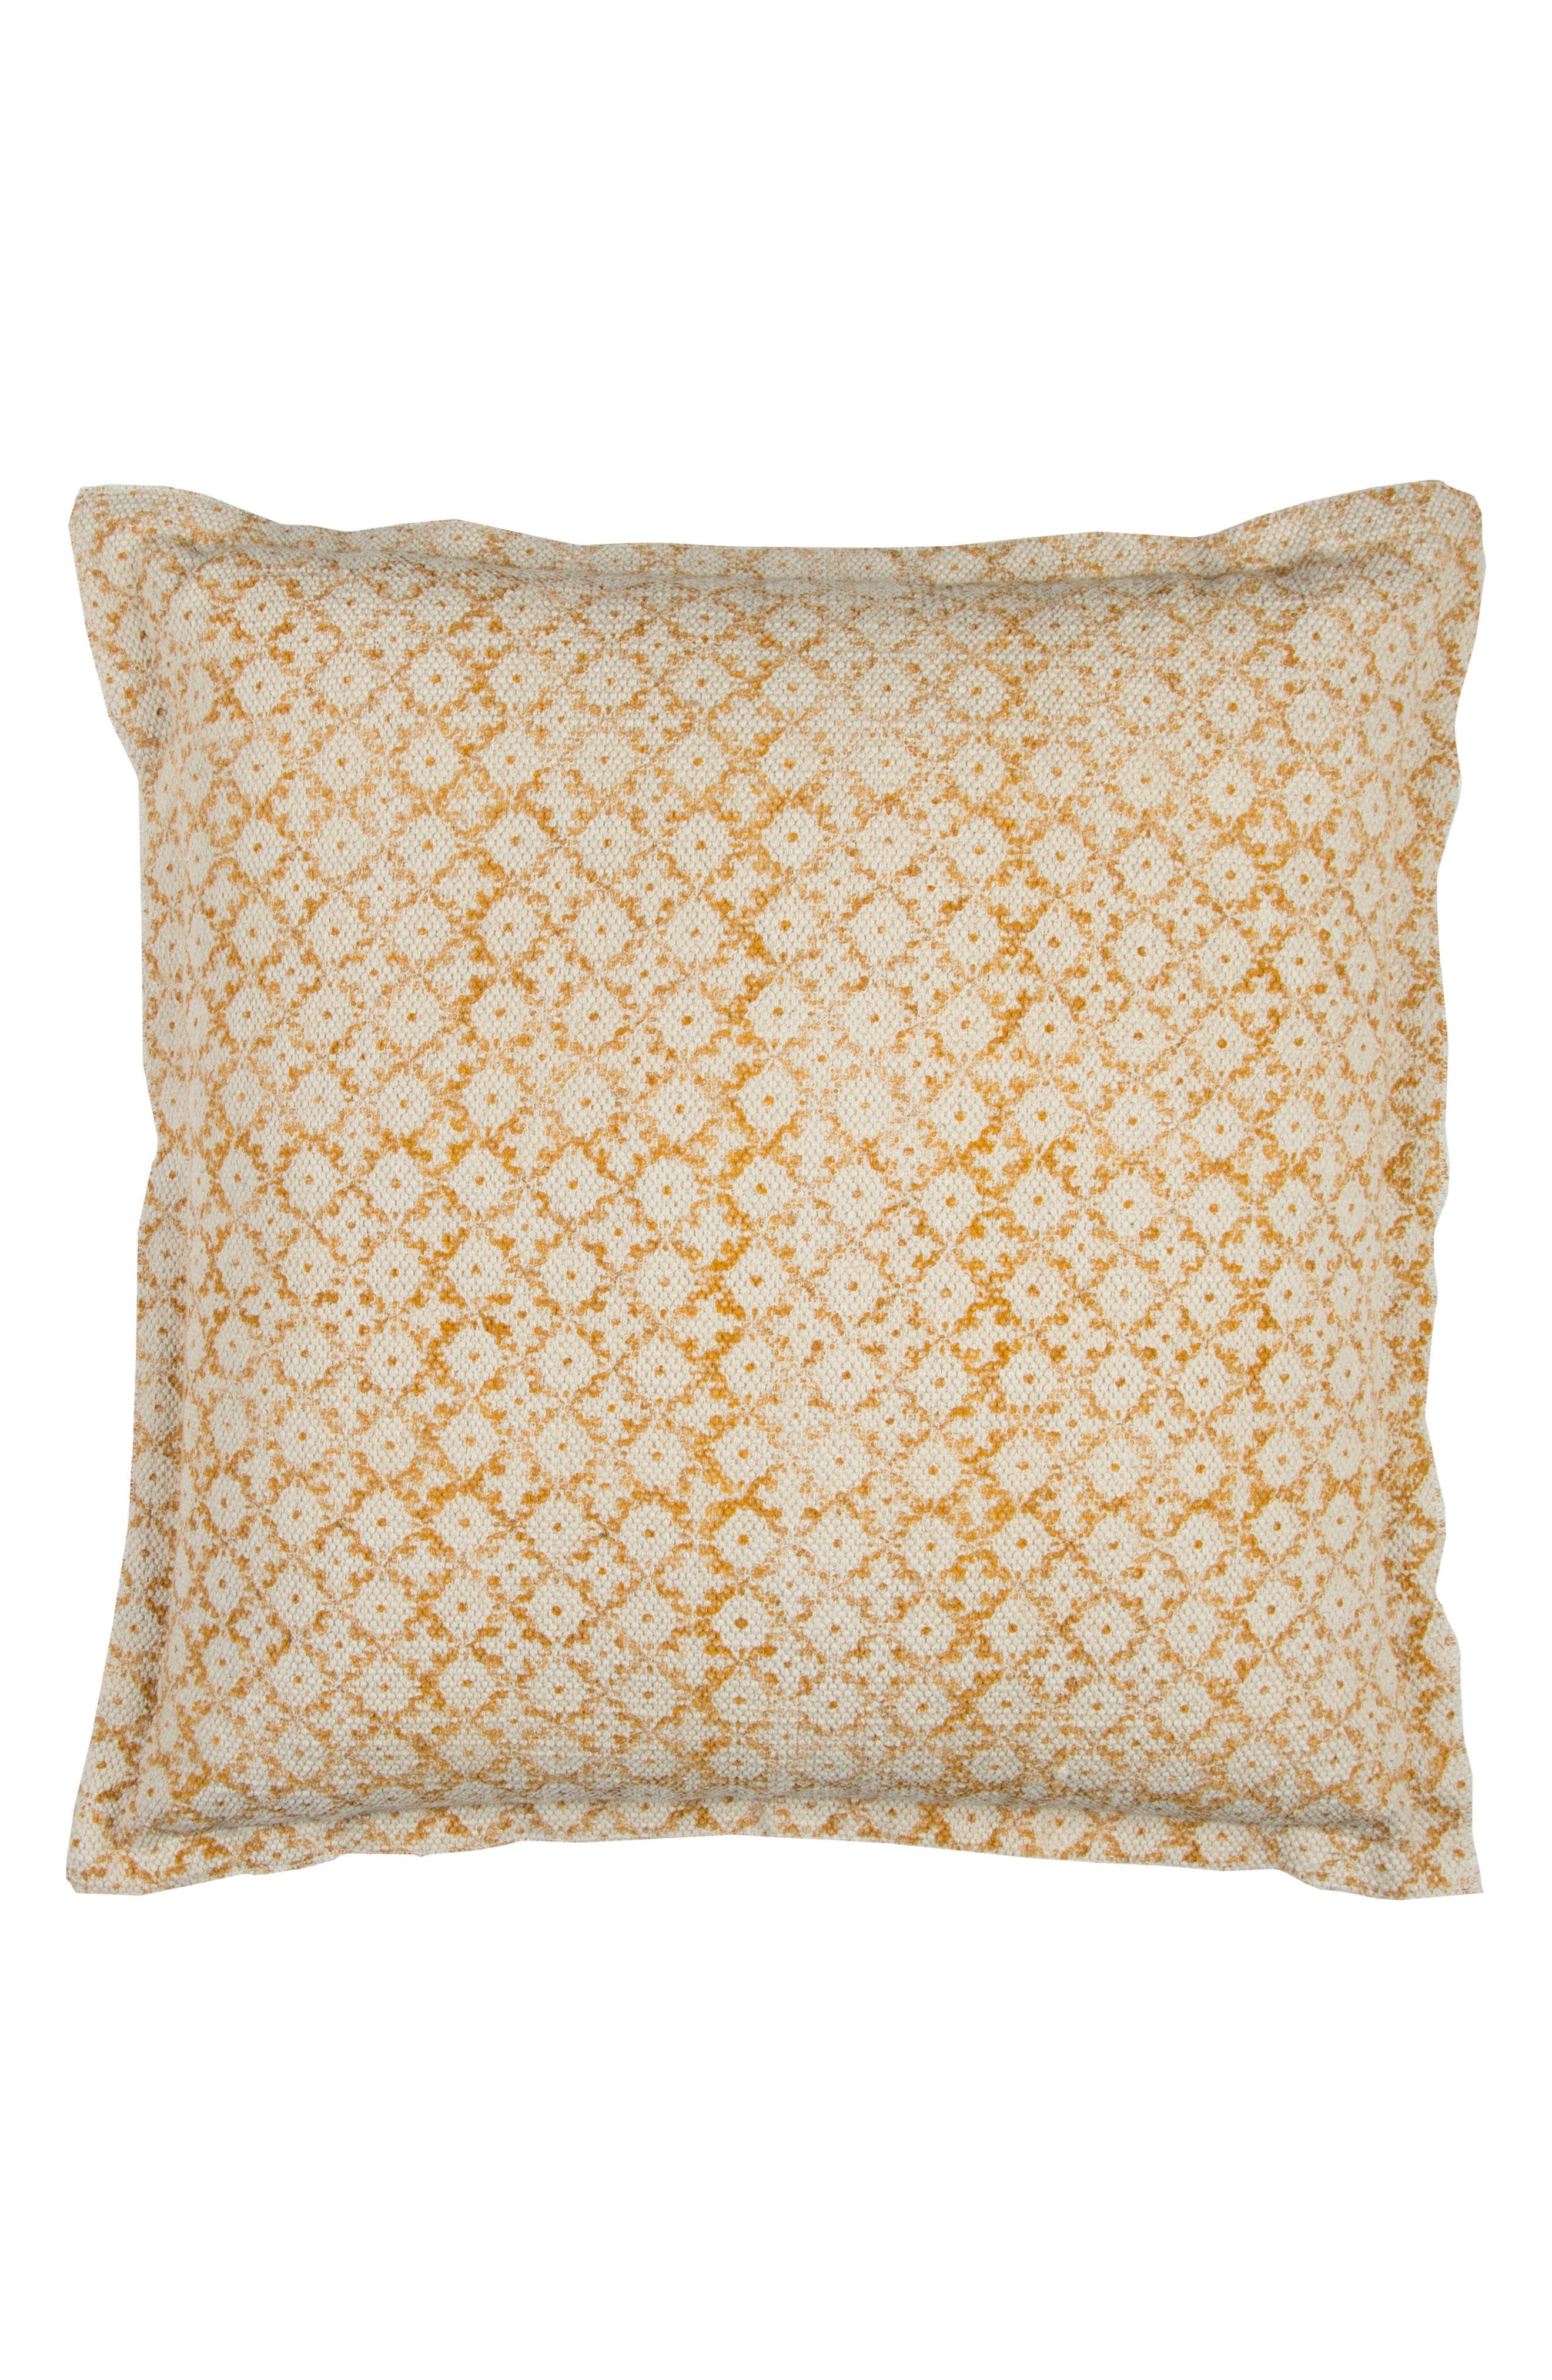 Geometric Accent Pillow,                         Main,                         color, 900